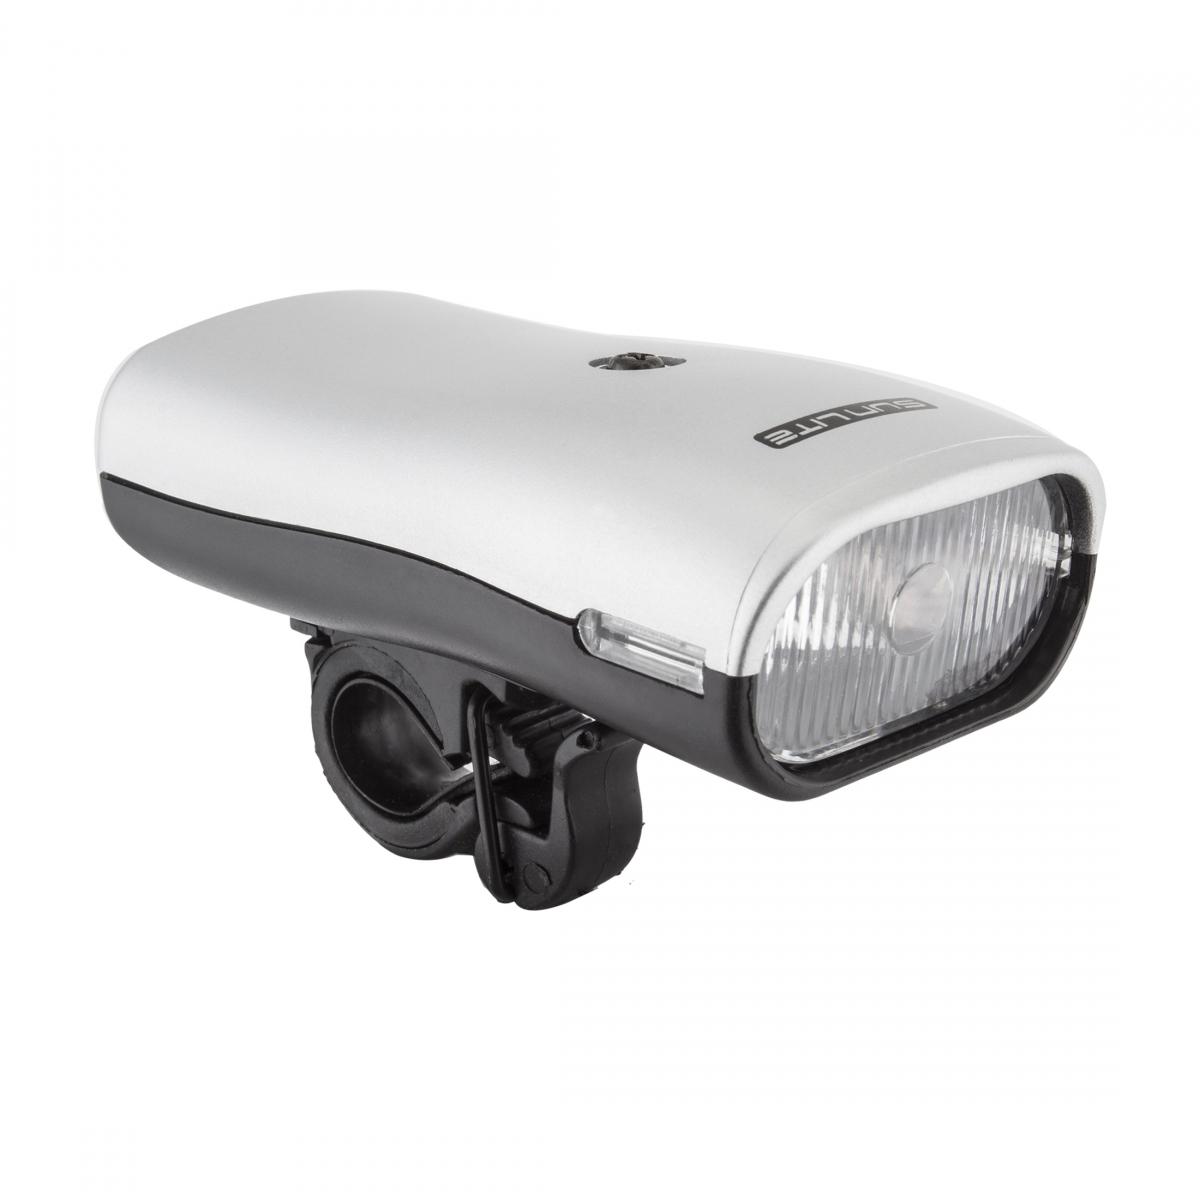 Sunlite HL-L380 LED Light Sunlt Ft Hl-l380 3-led